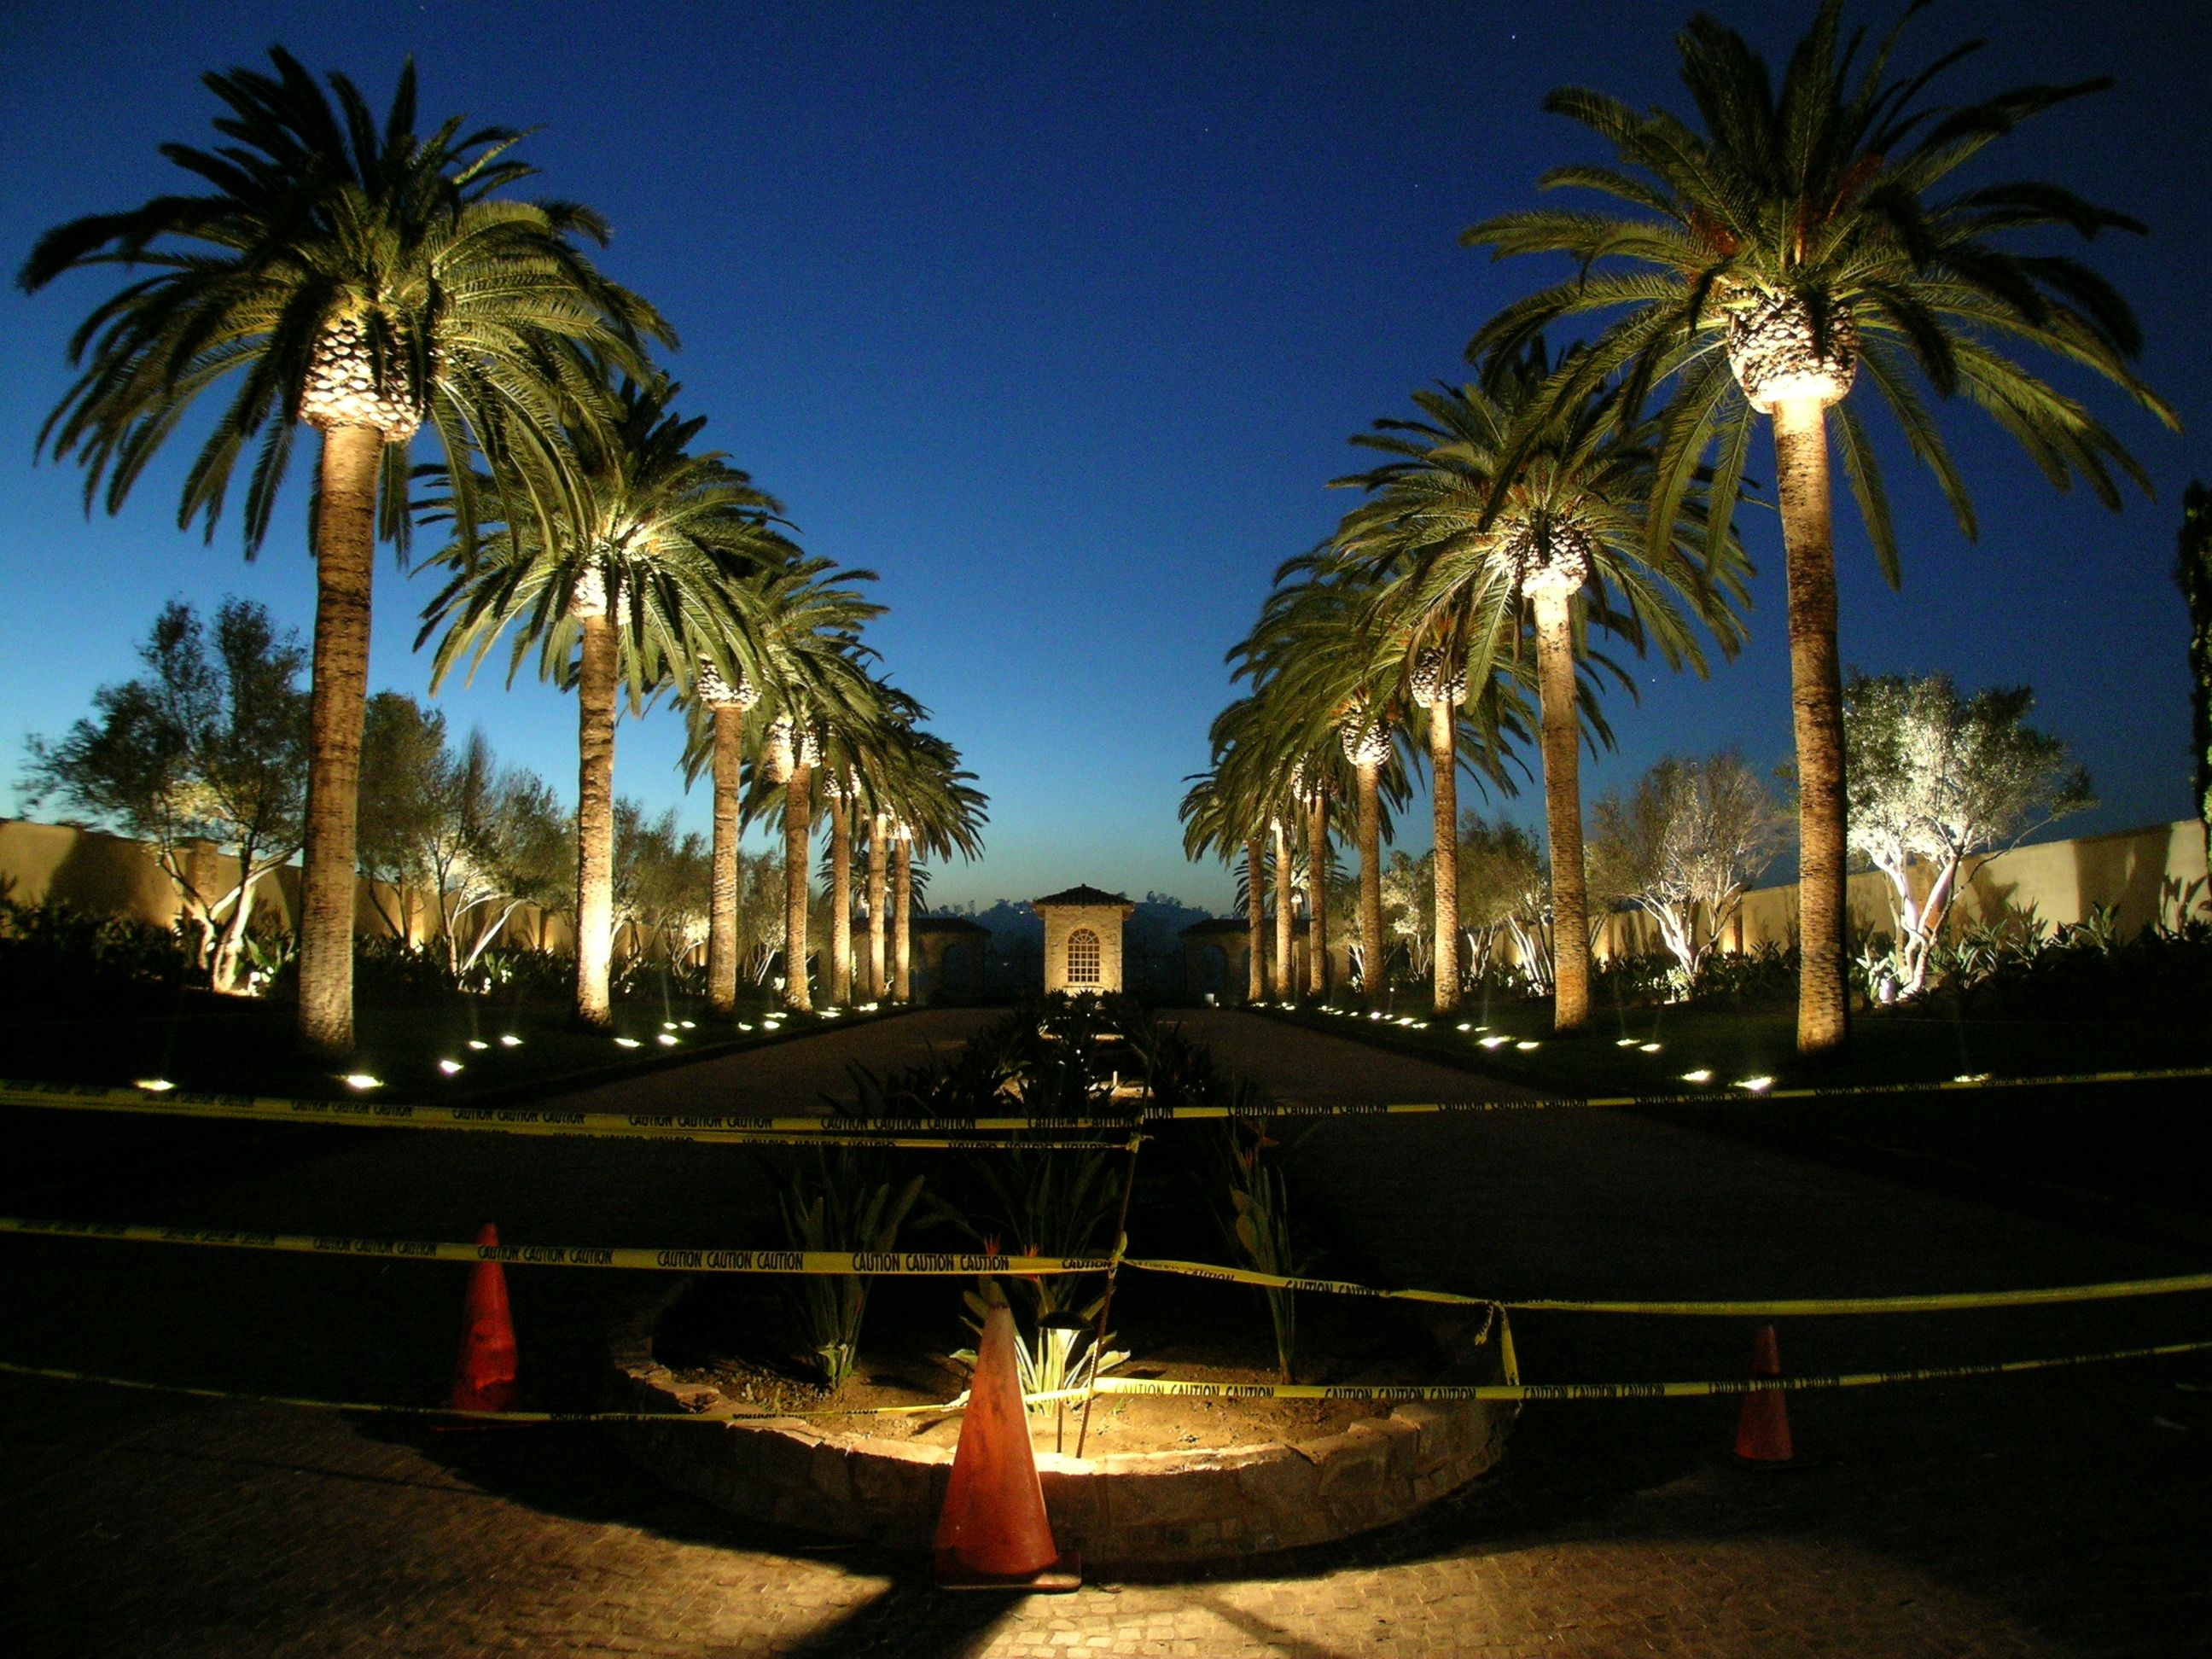 artistic illumination landscape lighting by mark mullen in rancho santa fe call for a design 7605358750 landscape lighting design ideas 1000 images m59 landscape